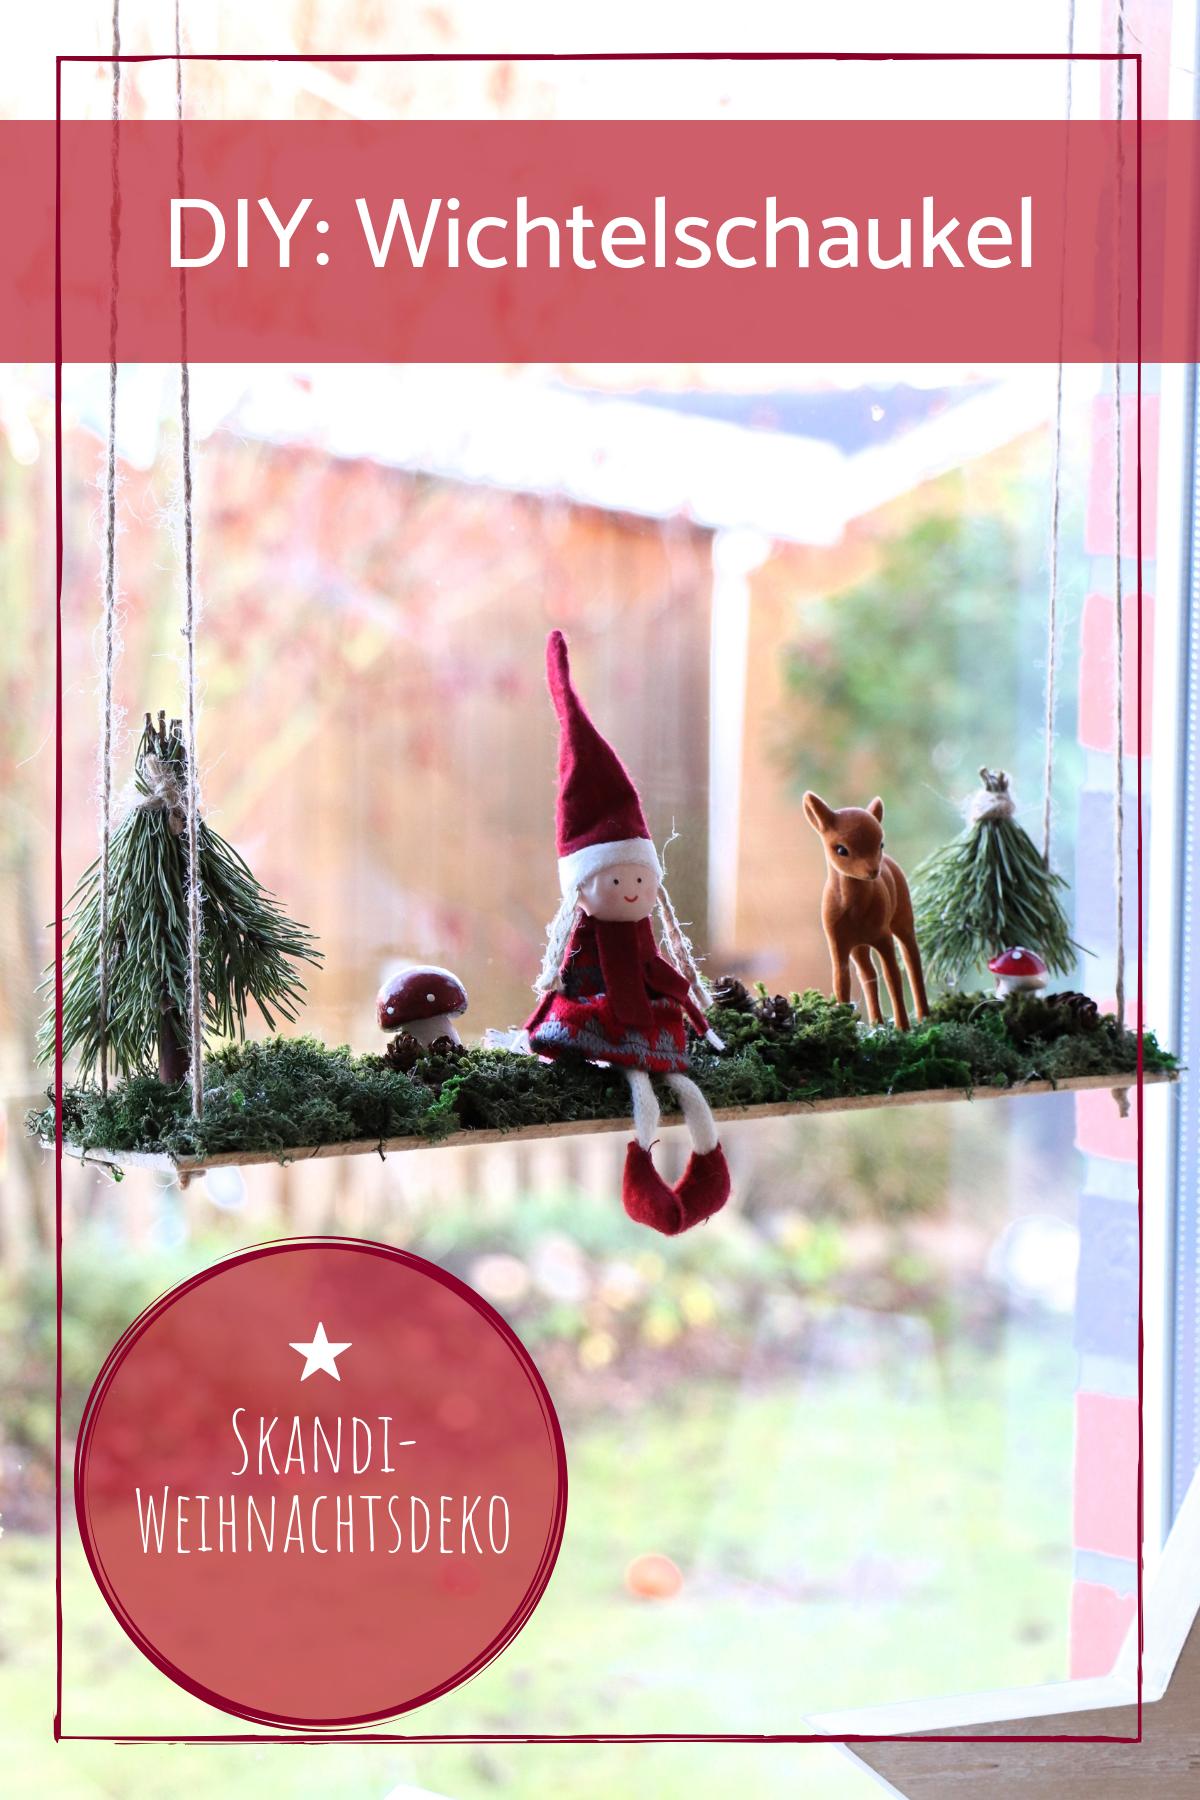 Photo of DIY: Imp swing as a Christmas window decoration